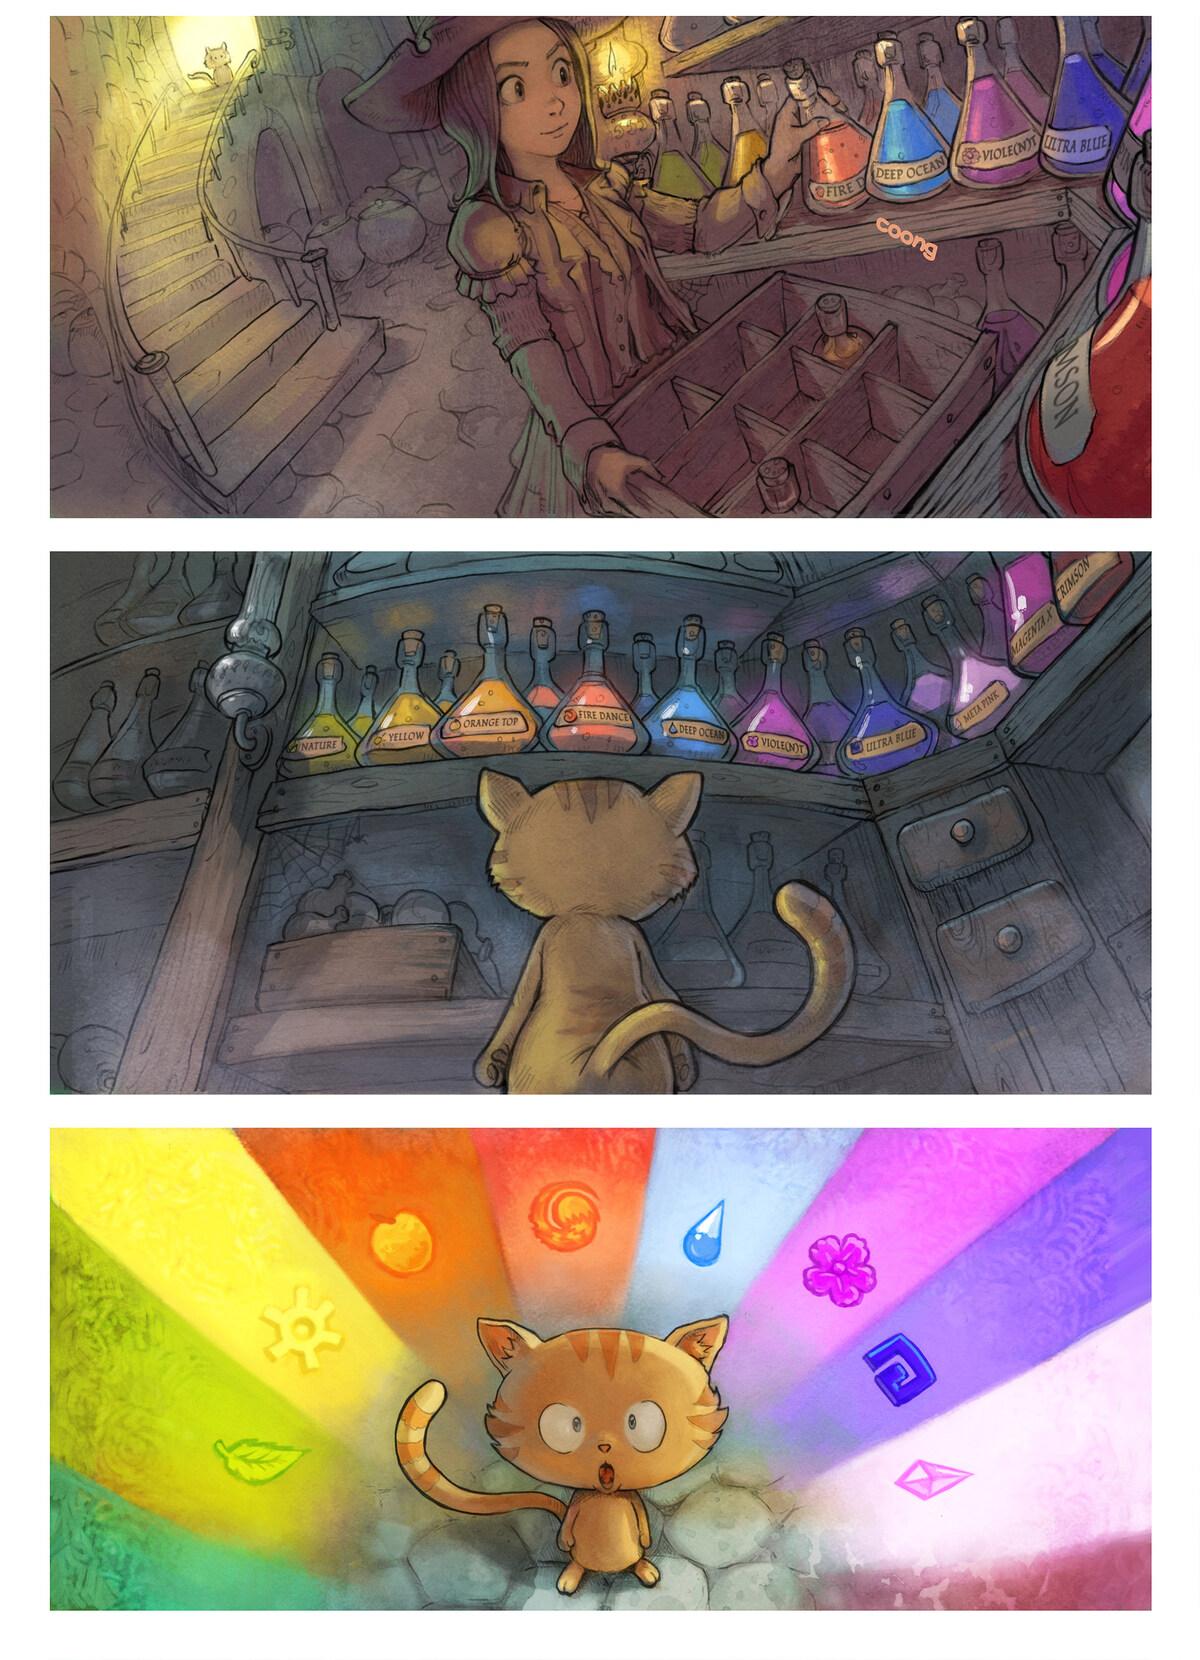 A webcomic page of Pepper&Carrot, Tập 2 [vi], trang 2